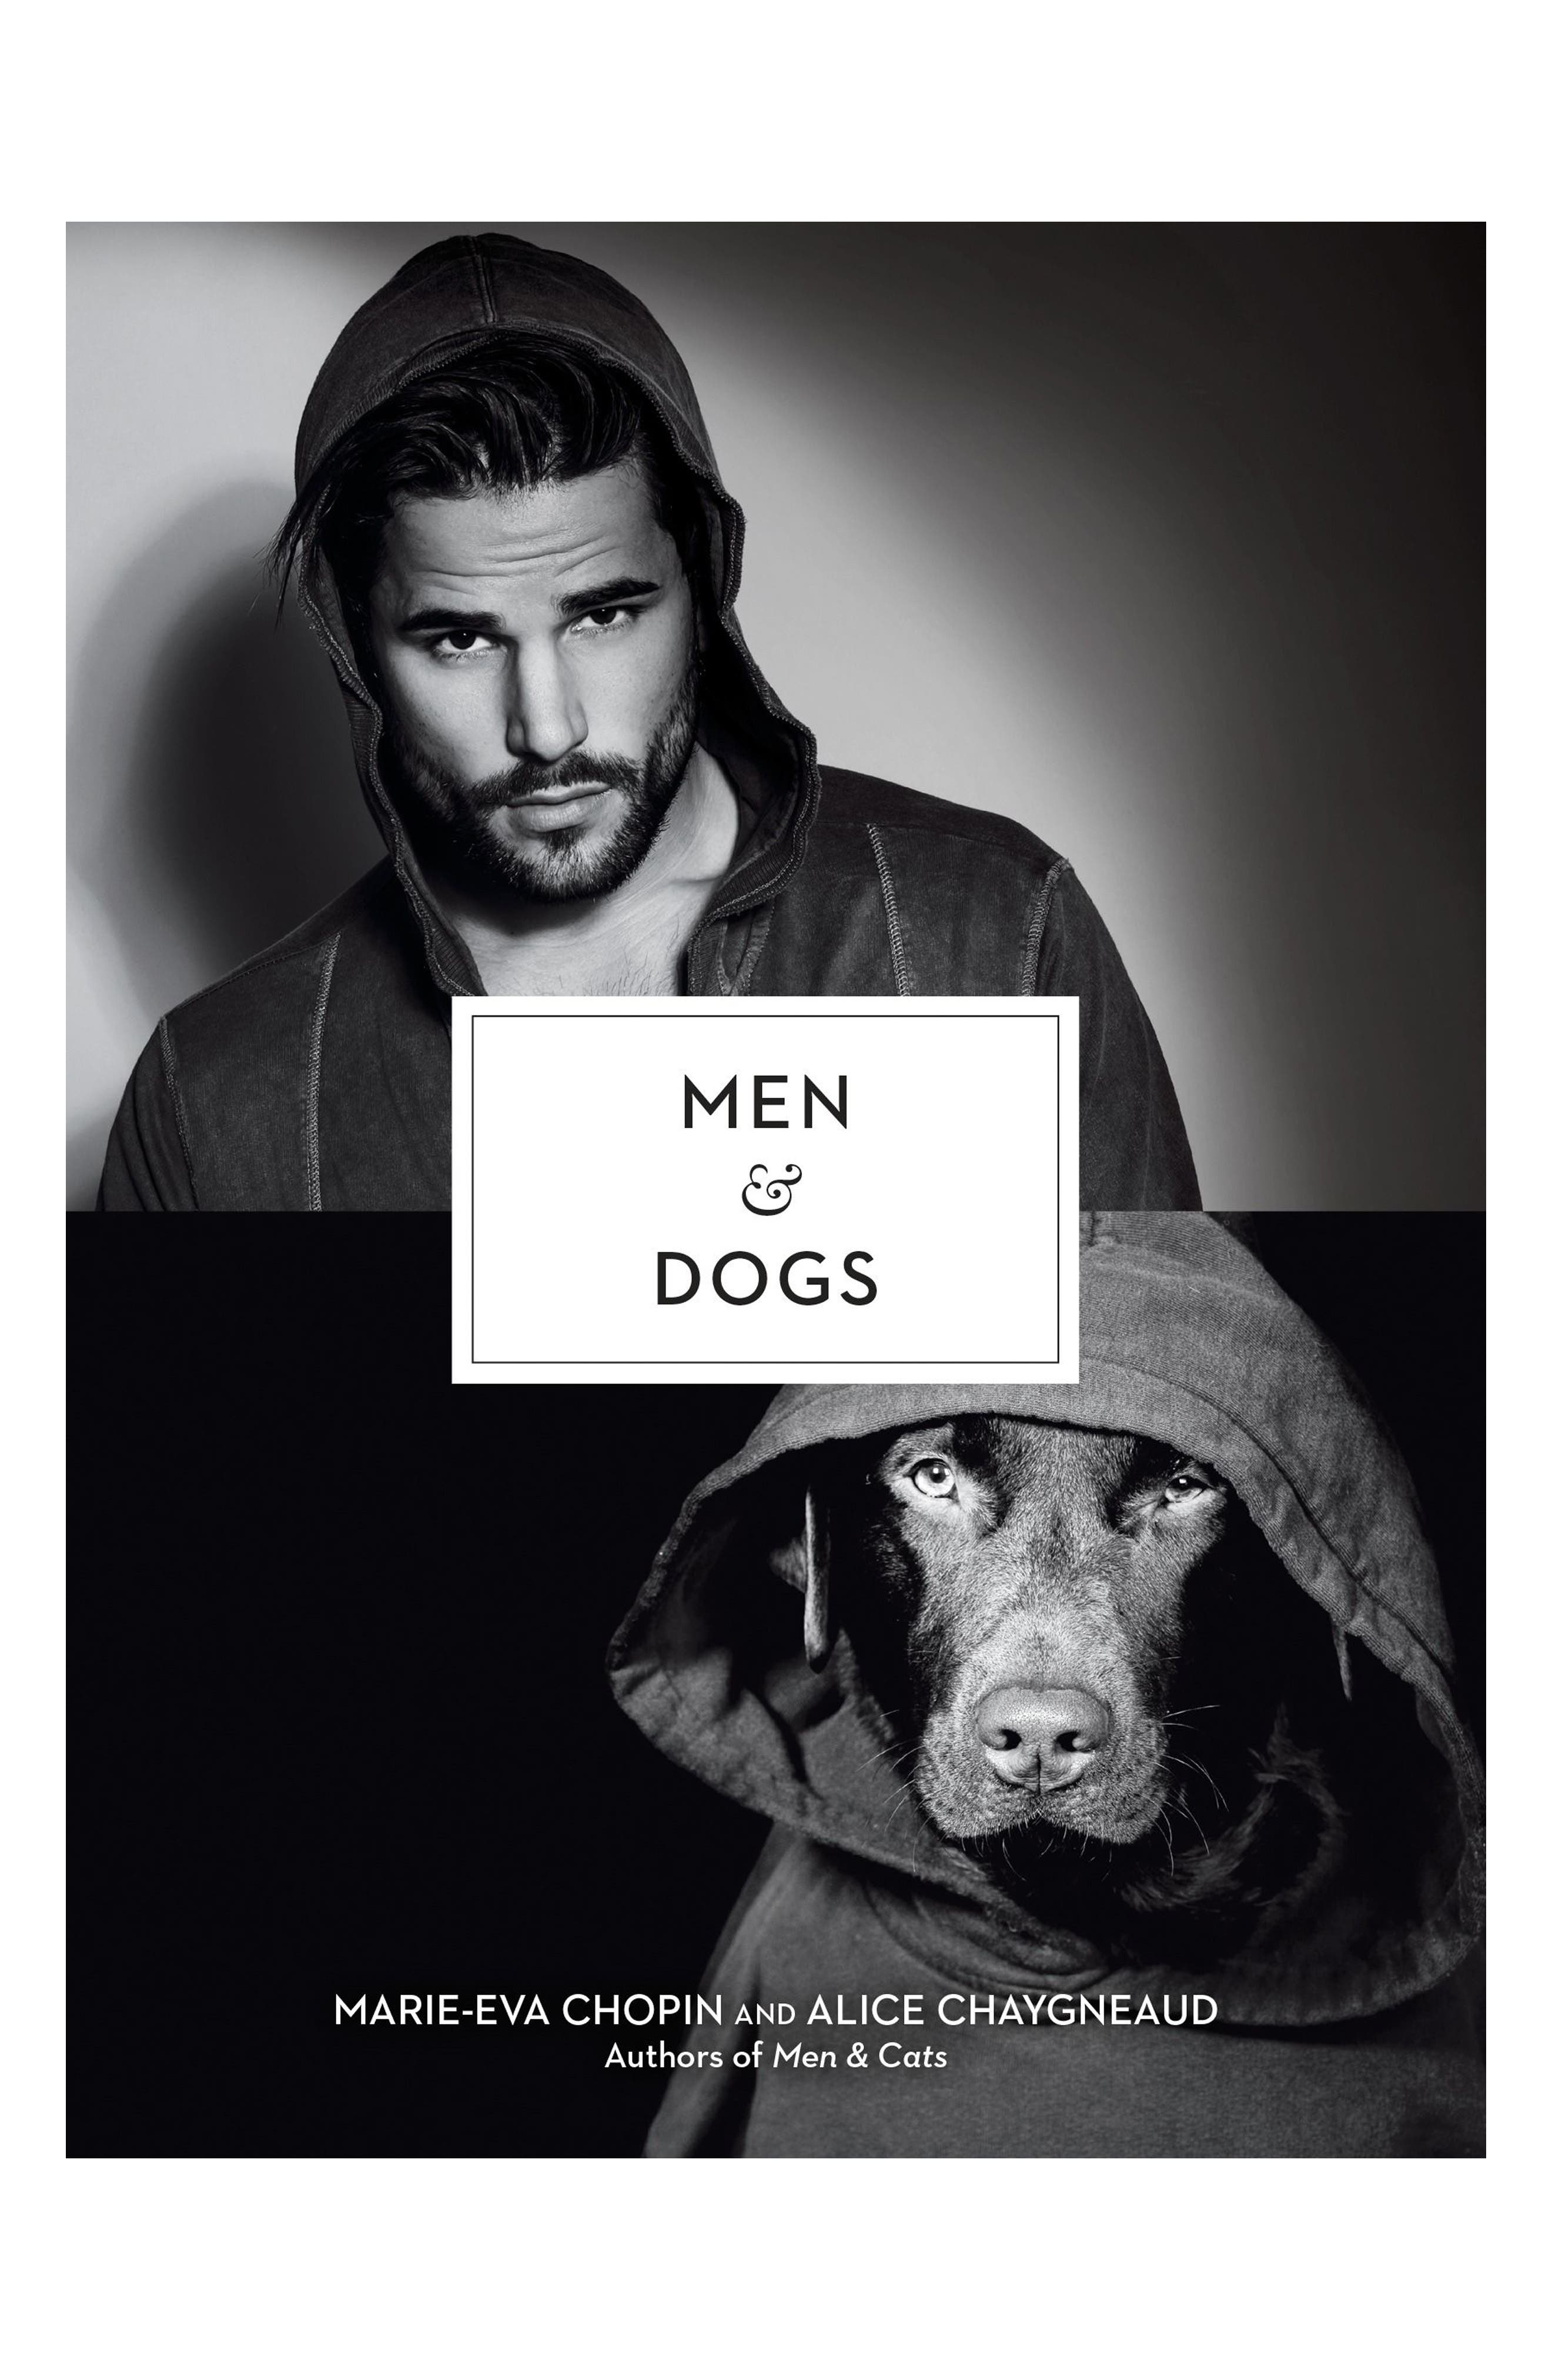 Main Image - 'Men & Dogs' Book